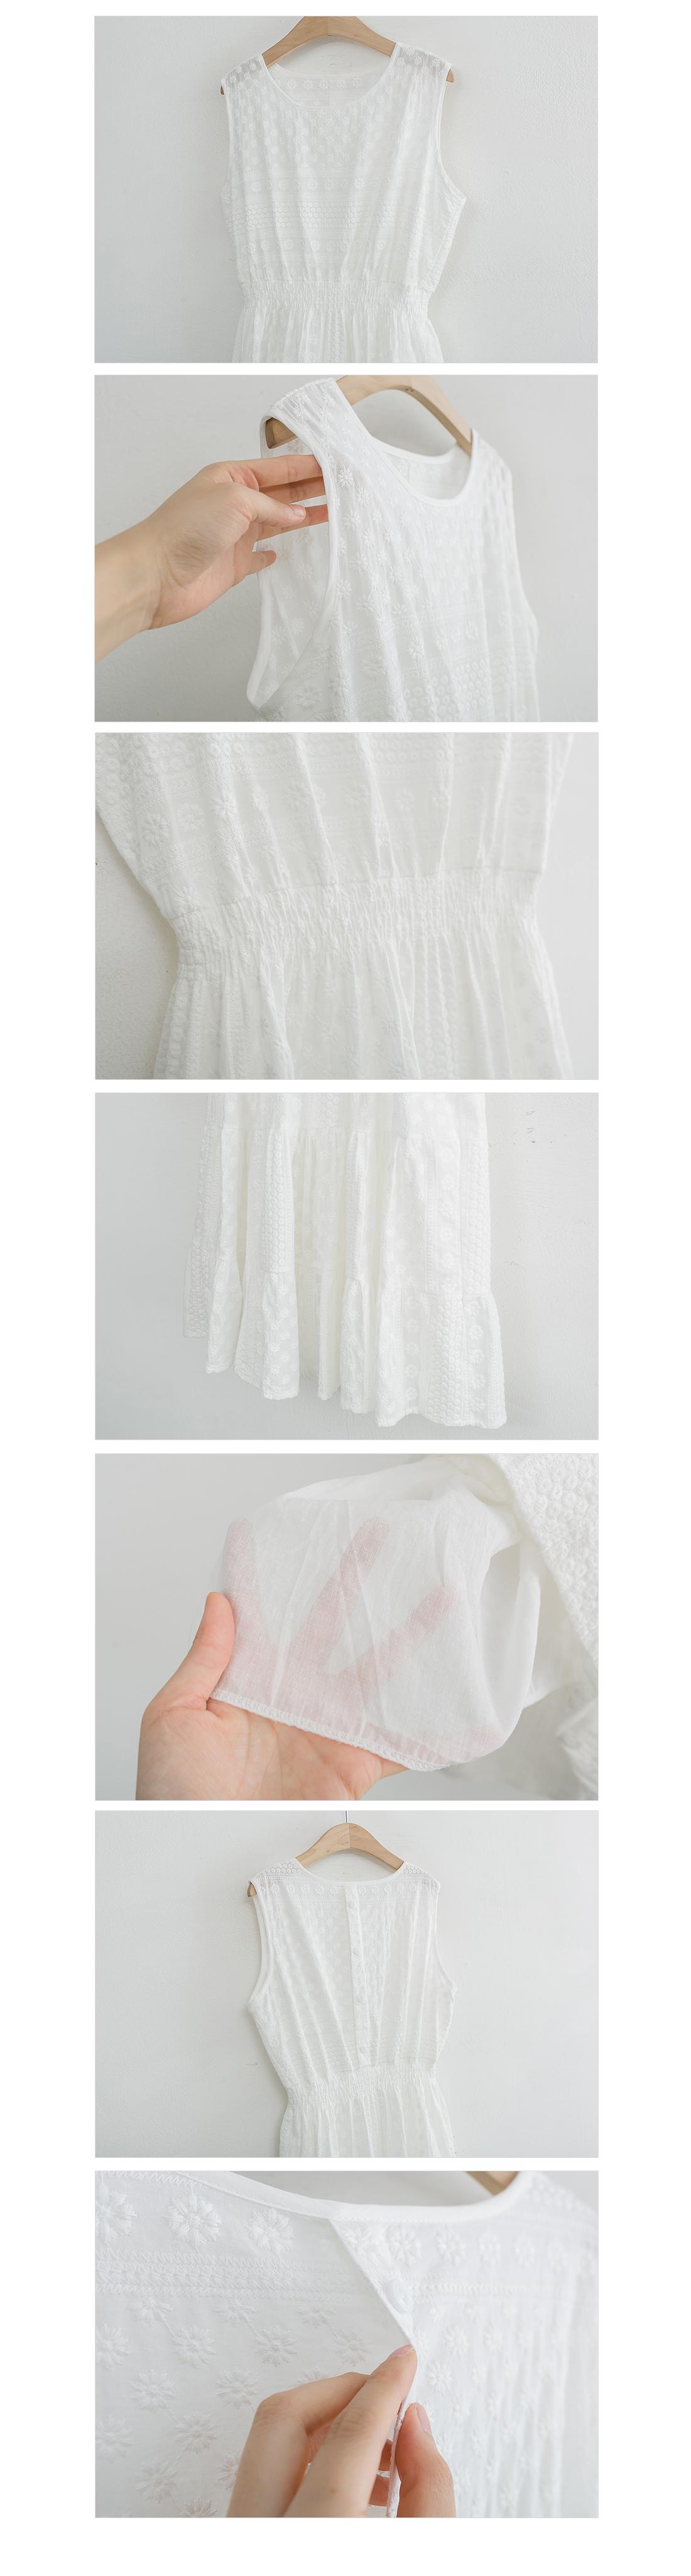 Royer Punching Nashi Dress #35420